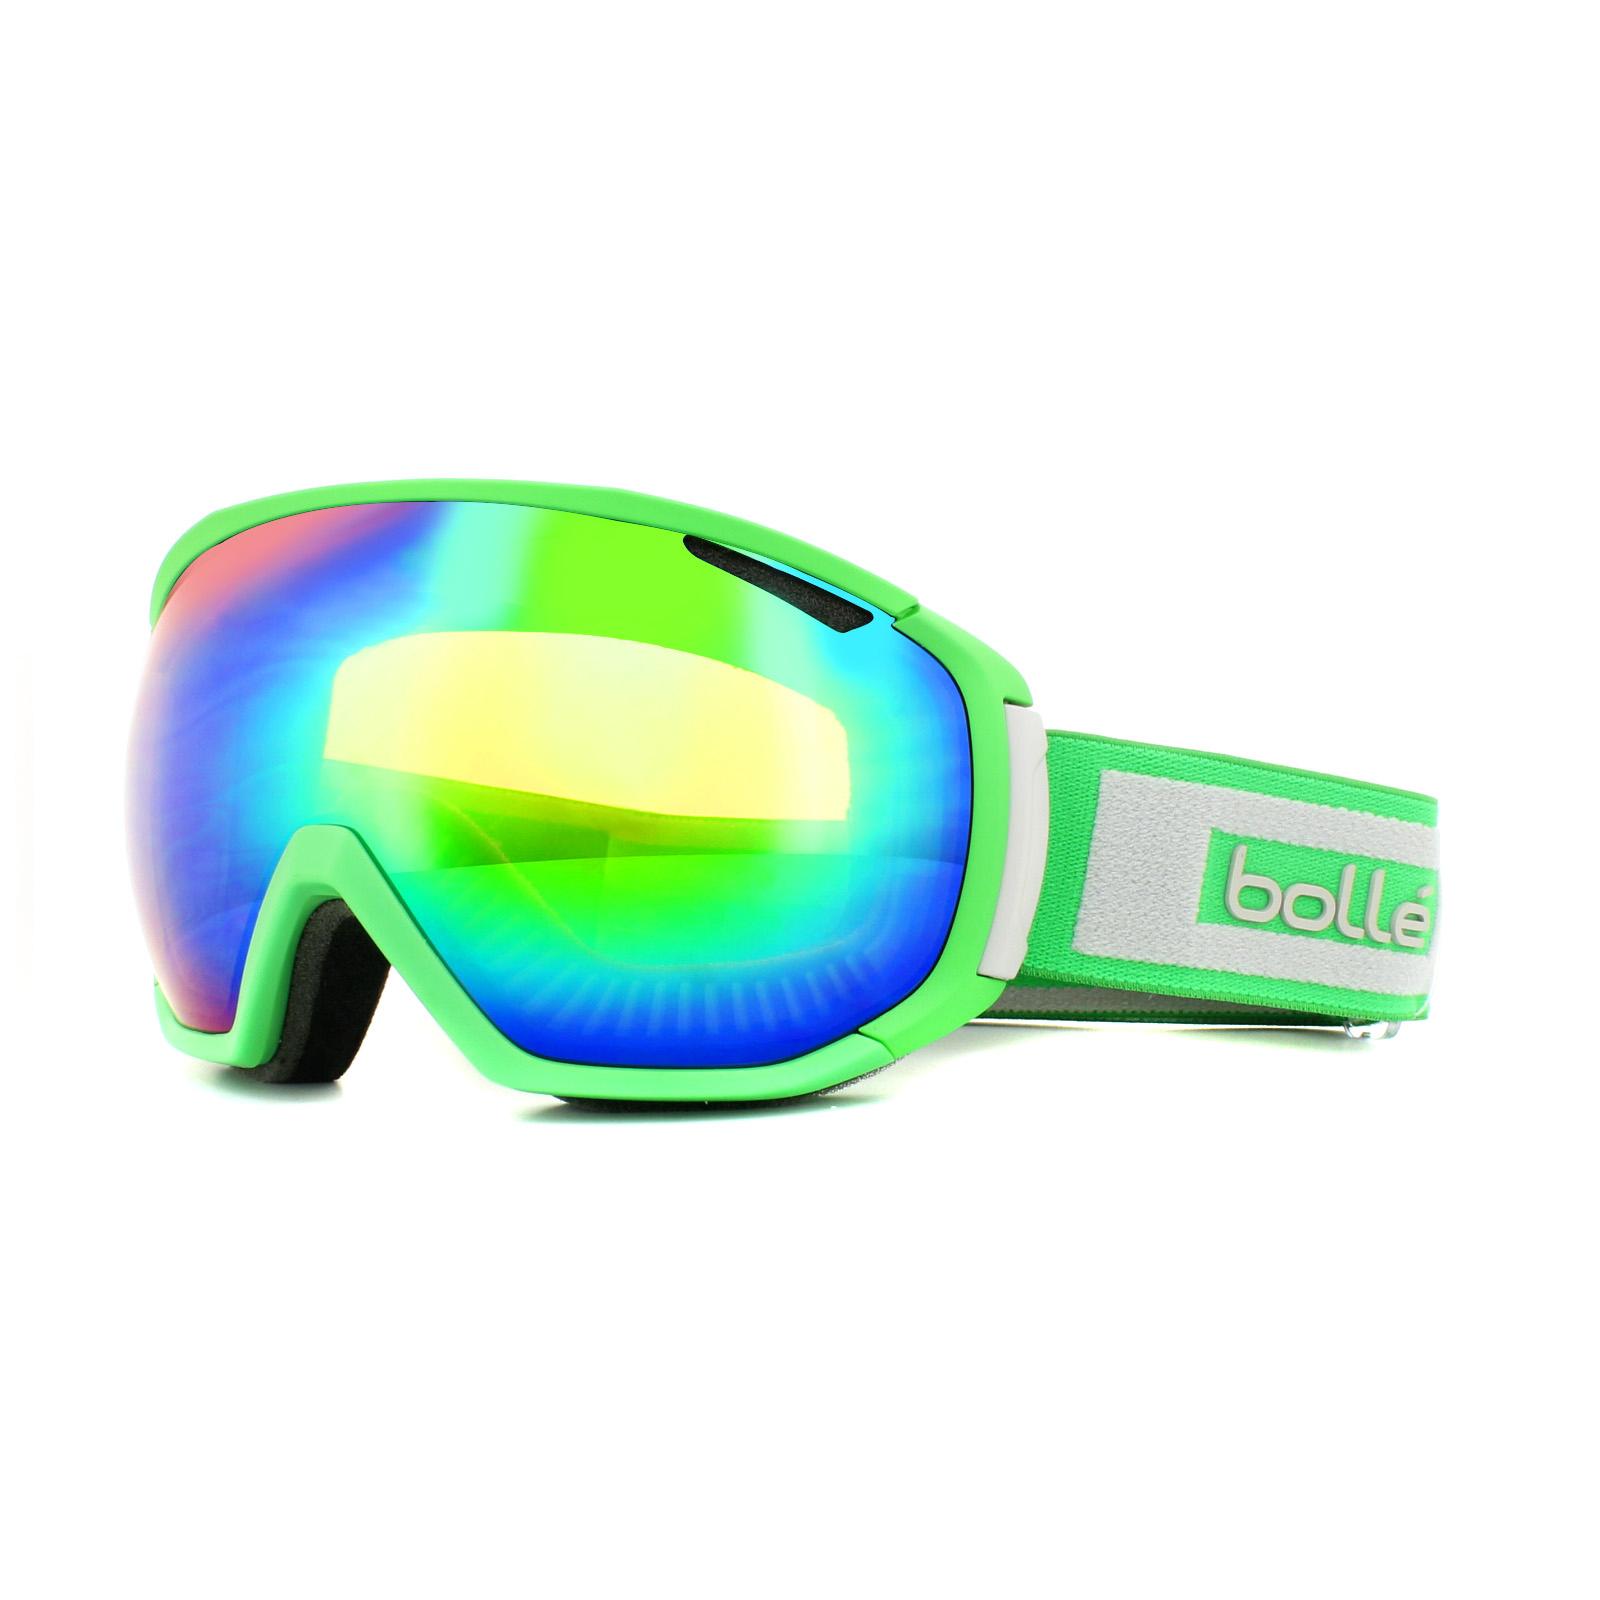 7b9f12cf2d Sentinel Bolle Ski Goggles Tsar 21444 Matt Green & Grey Green Emerald